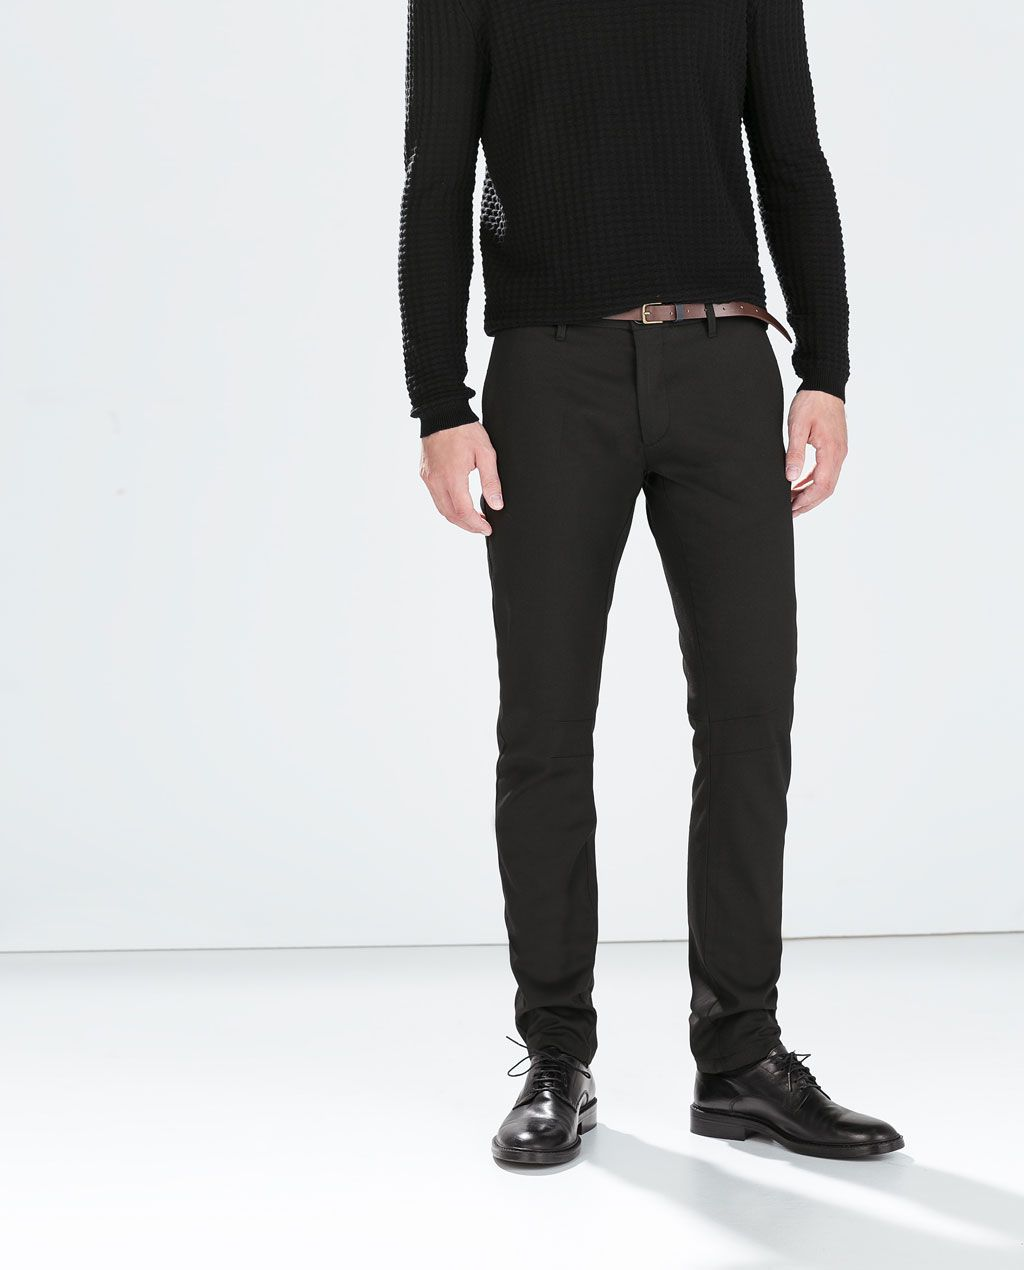 a9f0c01f ZARA - SALE - PLAIN TROUSERS WITH BELT | boyfriend | Trousers, Zara ...